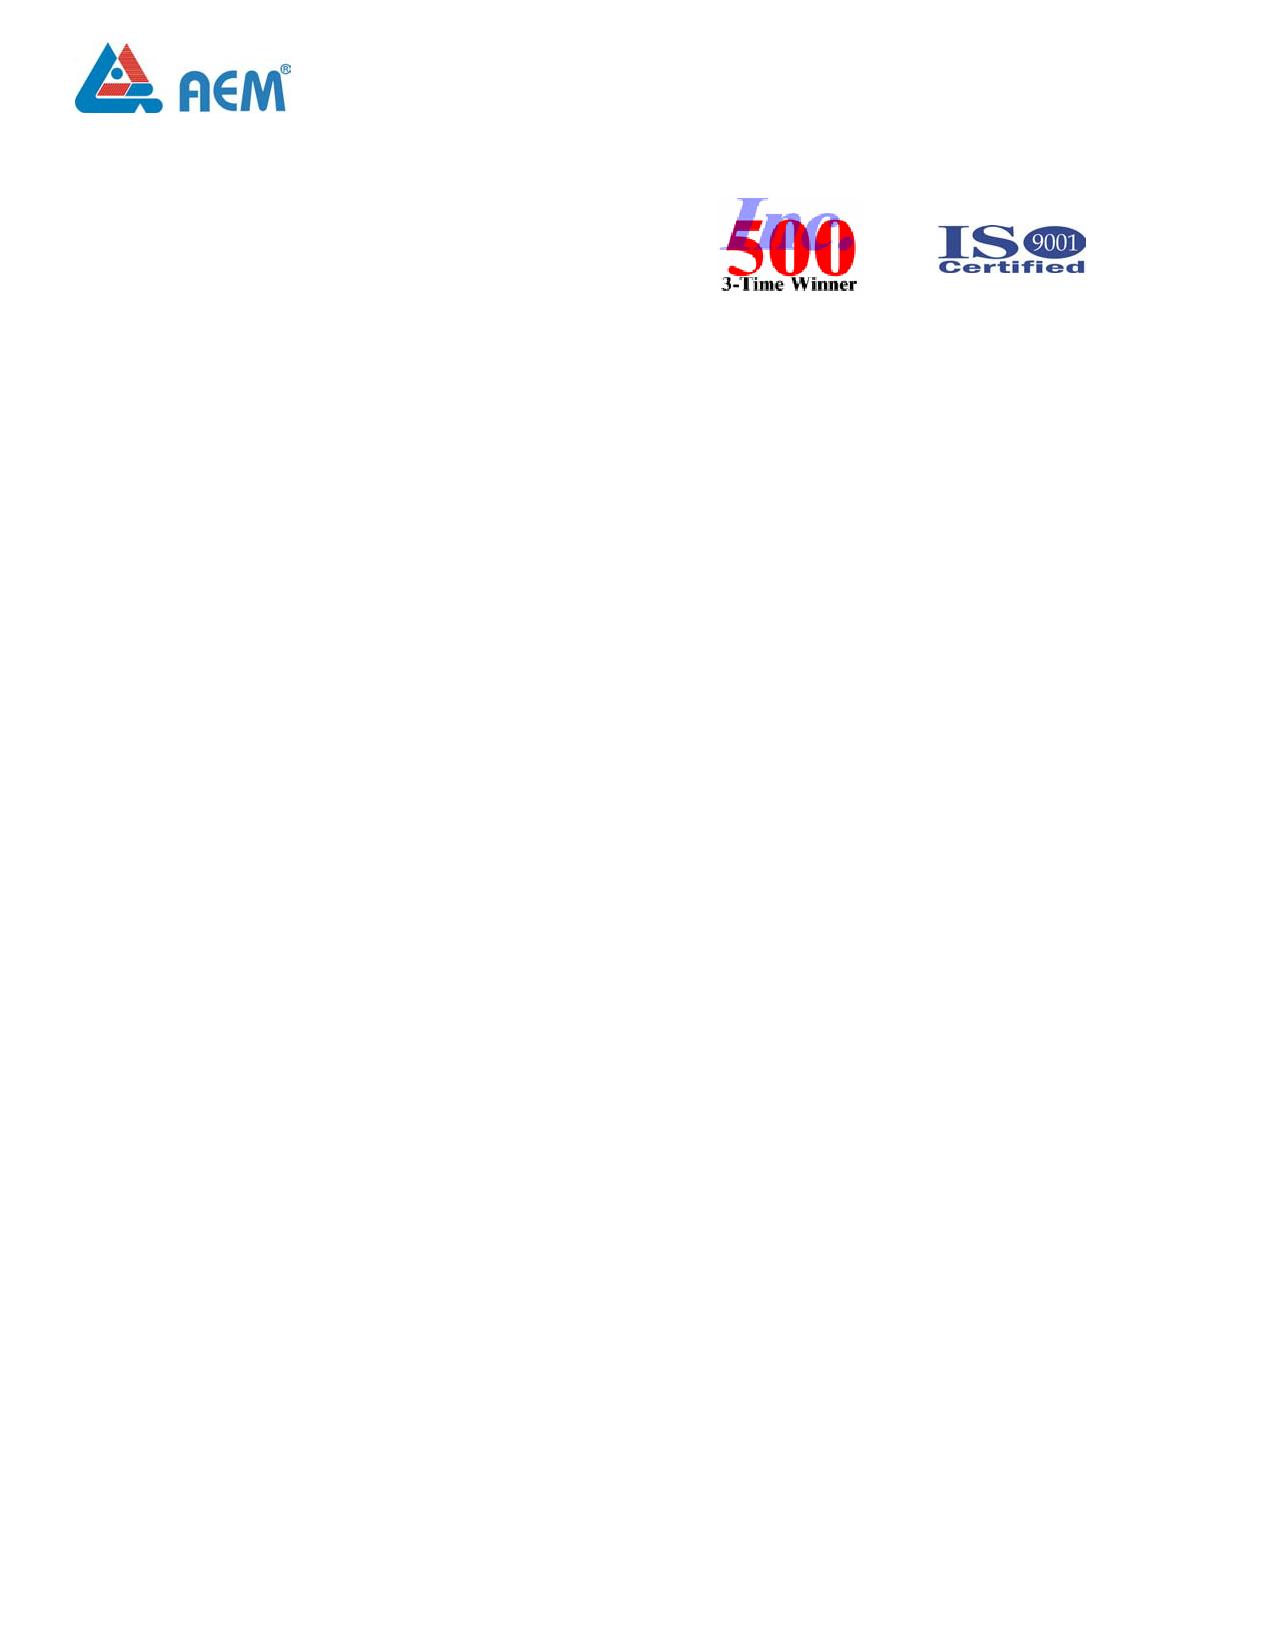 F0603FA0750V032T datasheet